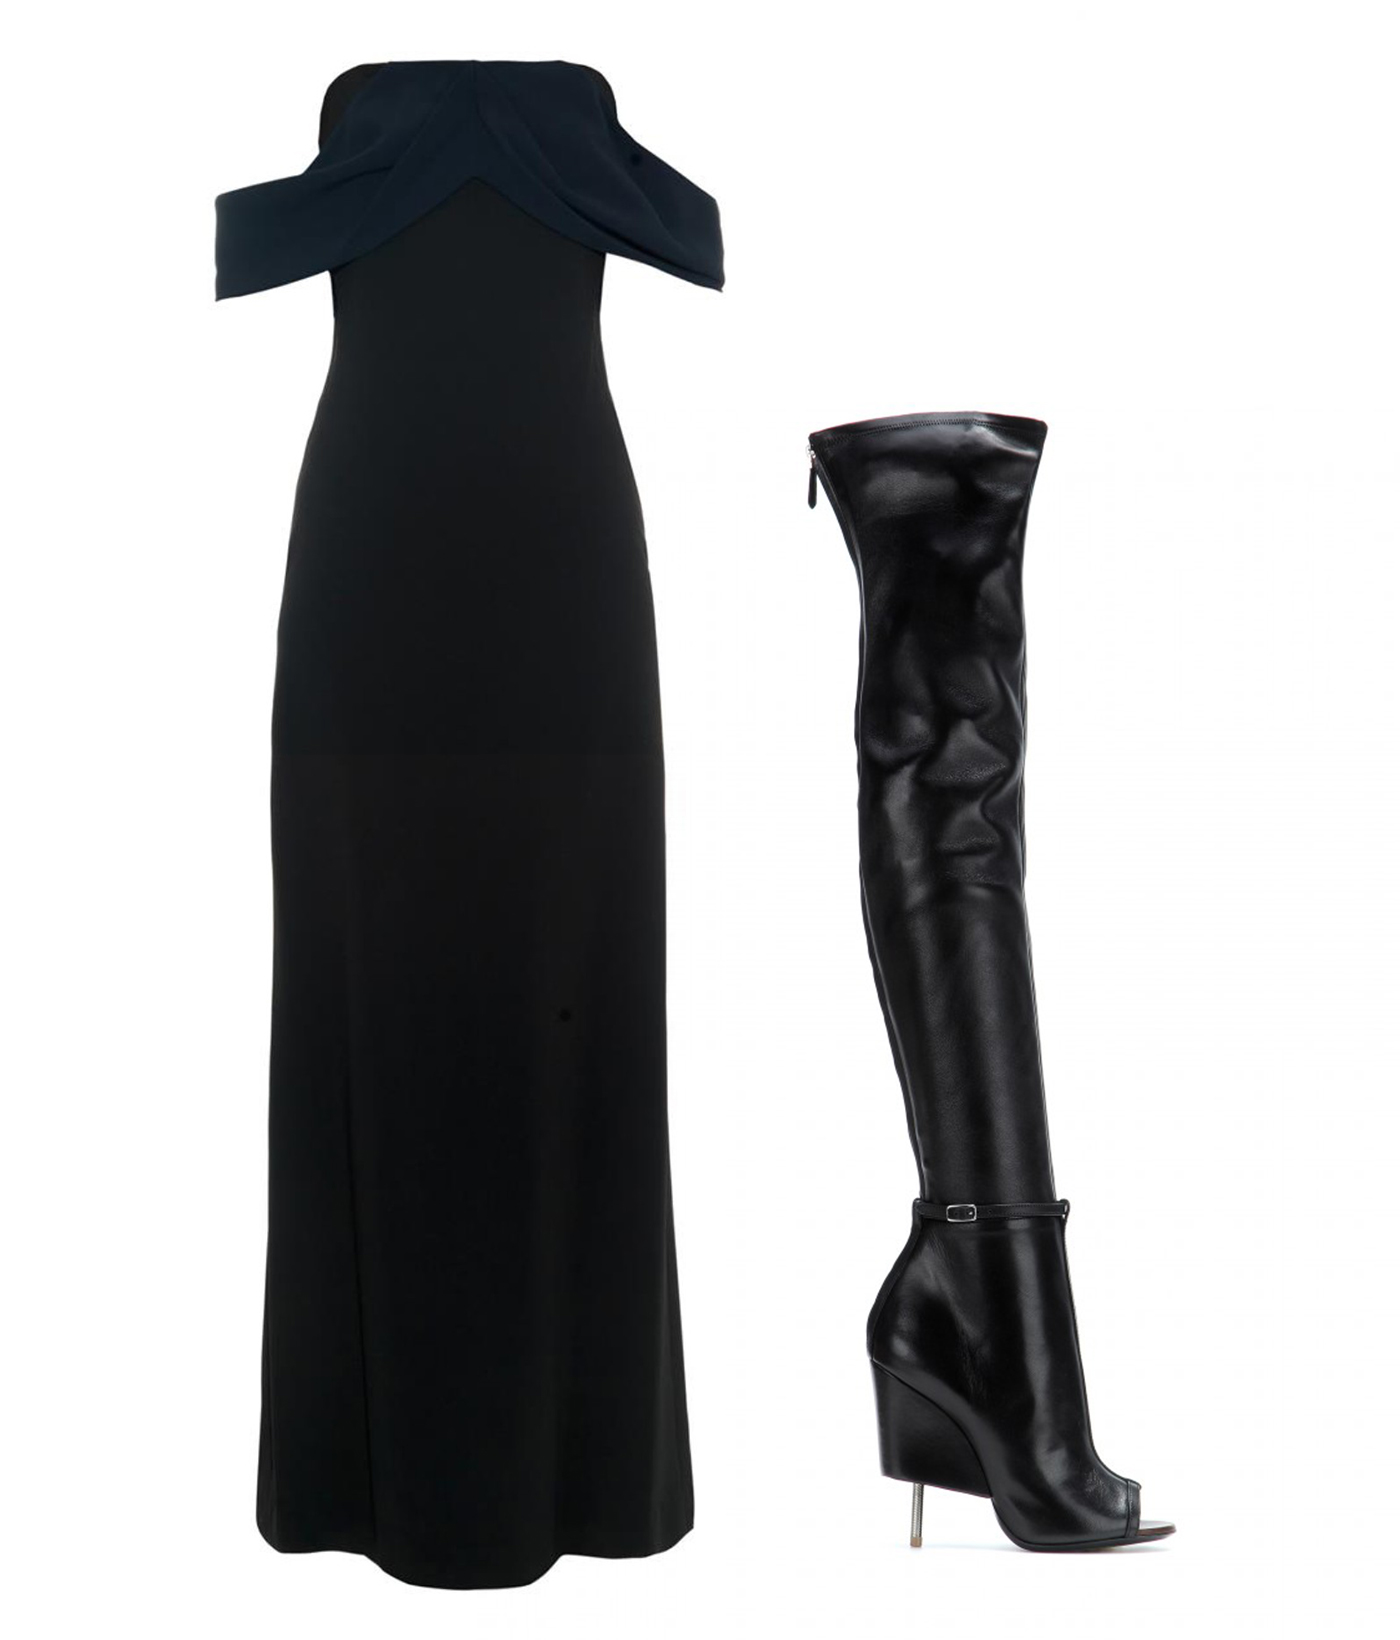 spring-wedding-dresses-accessories-29.jpg